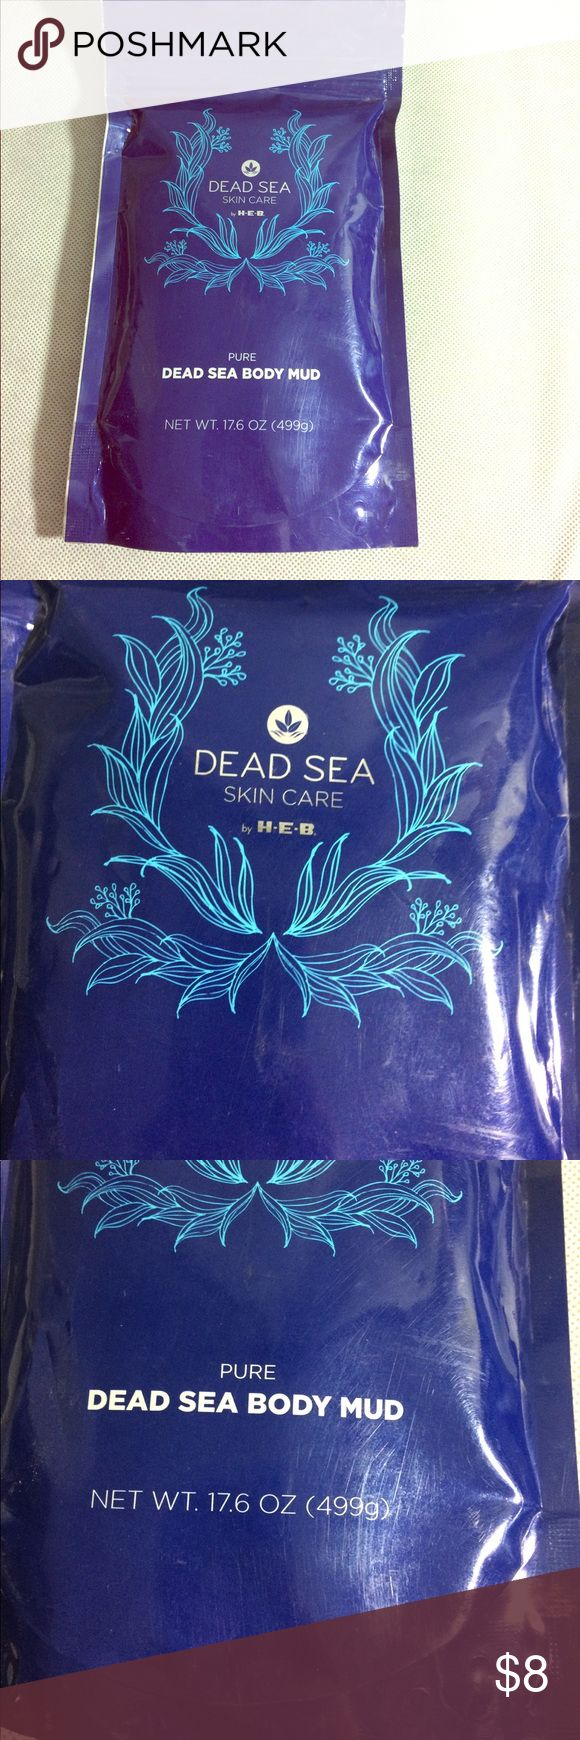 Dead sea body mud This is the dead sea skin care body mud H.E.B Makeup